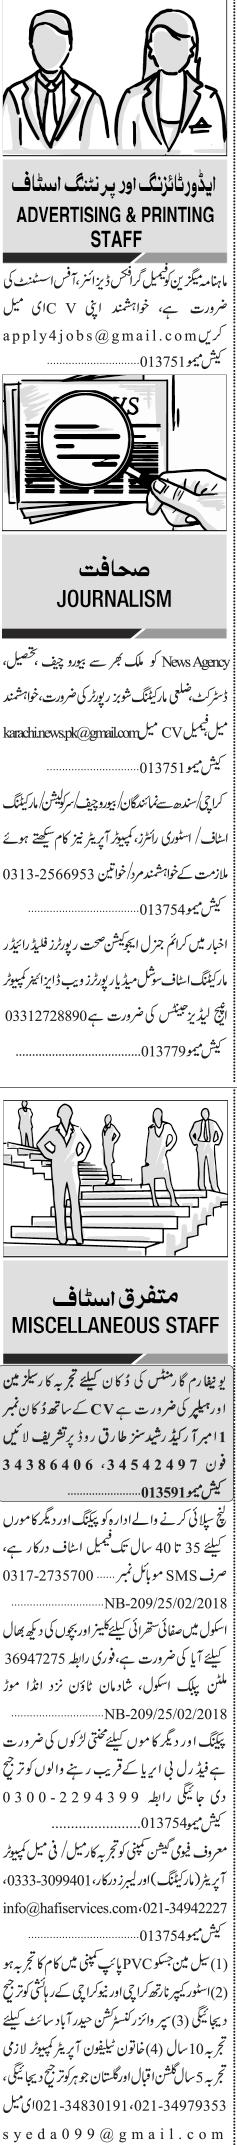 Female Computer Operators, marketing Staff Wanted